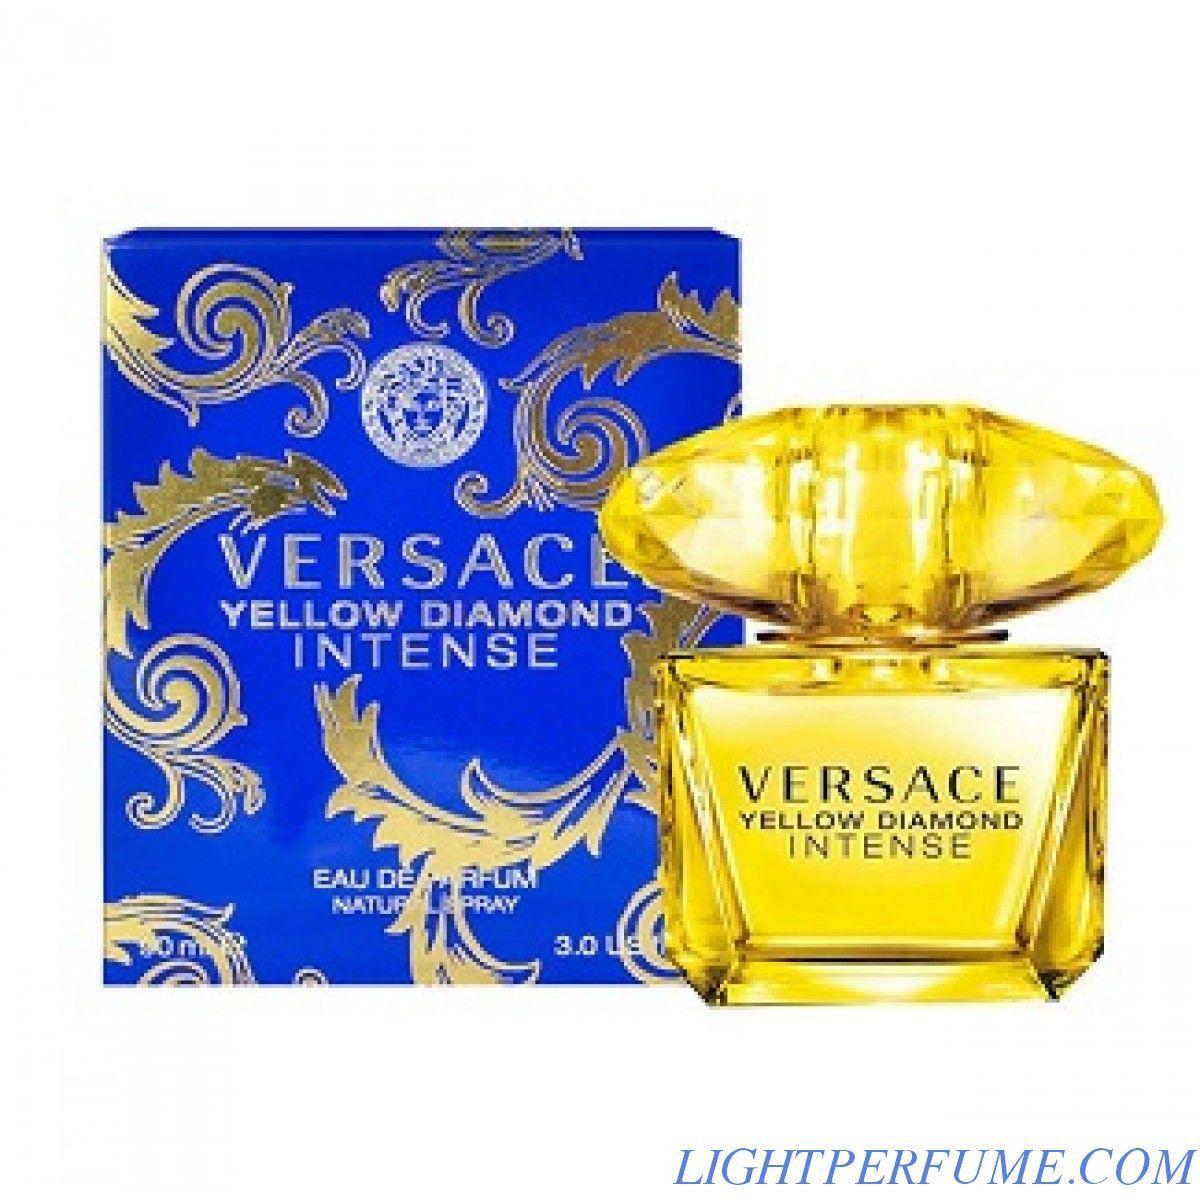 Nước hoa nữ Versace-Yellow Diamond Intense- 90ML